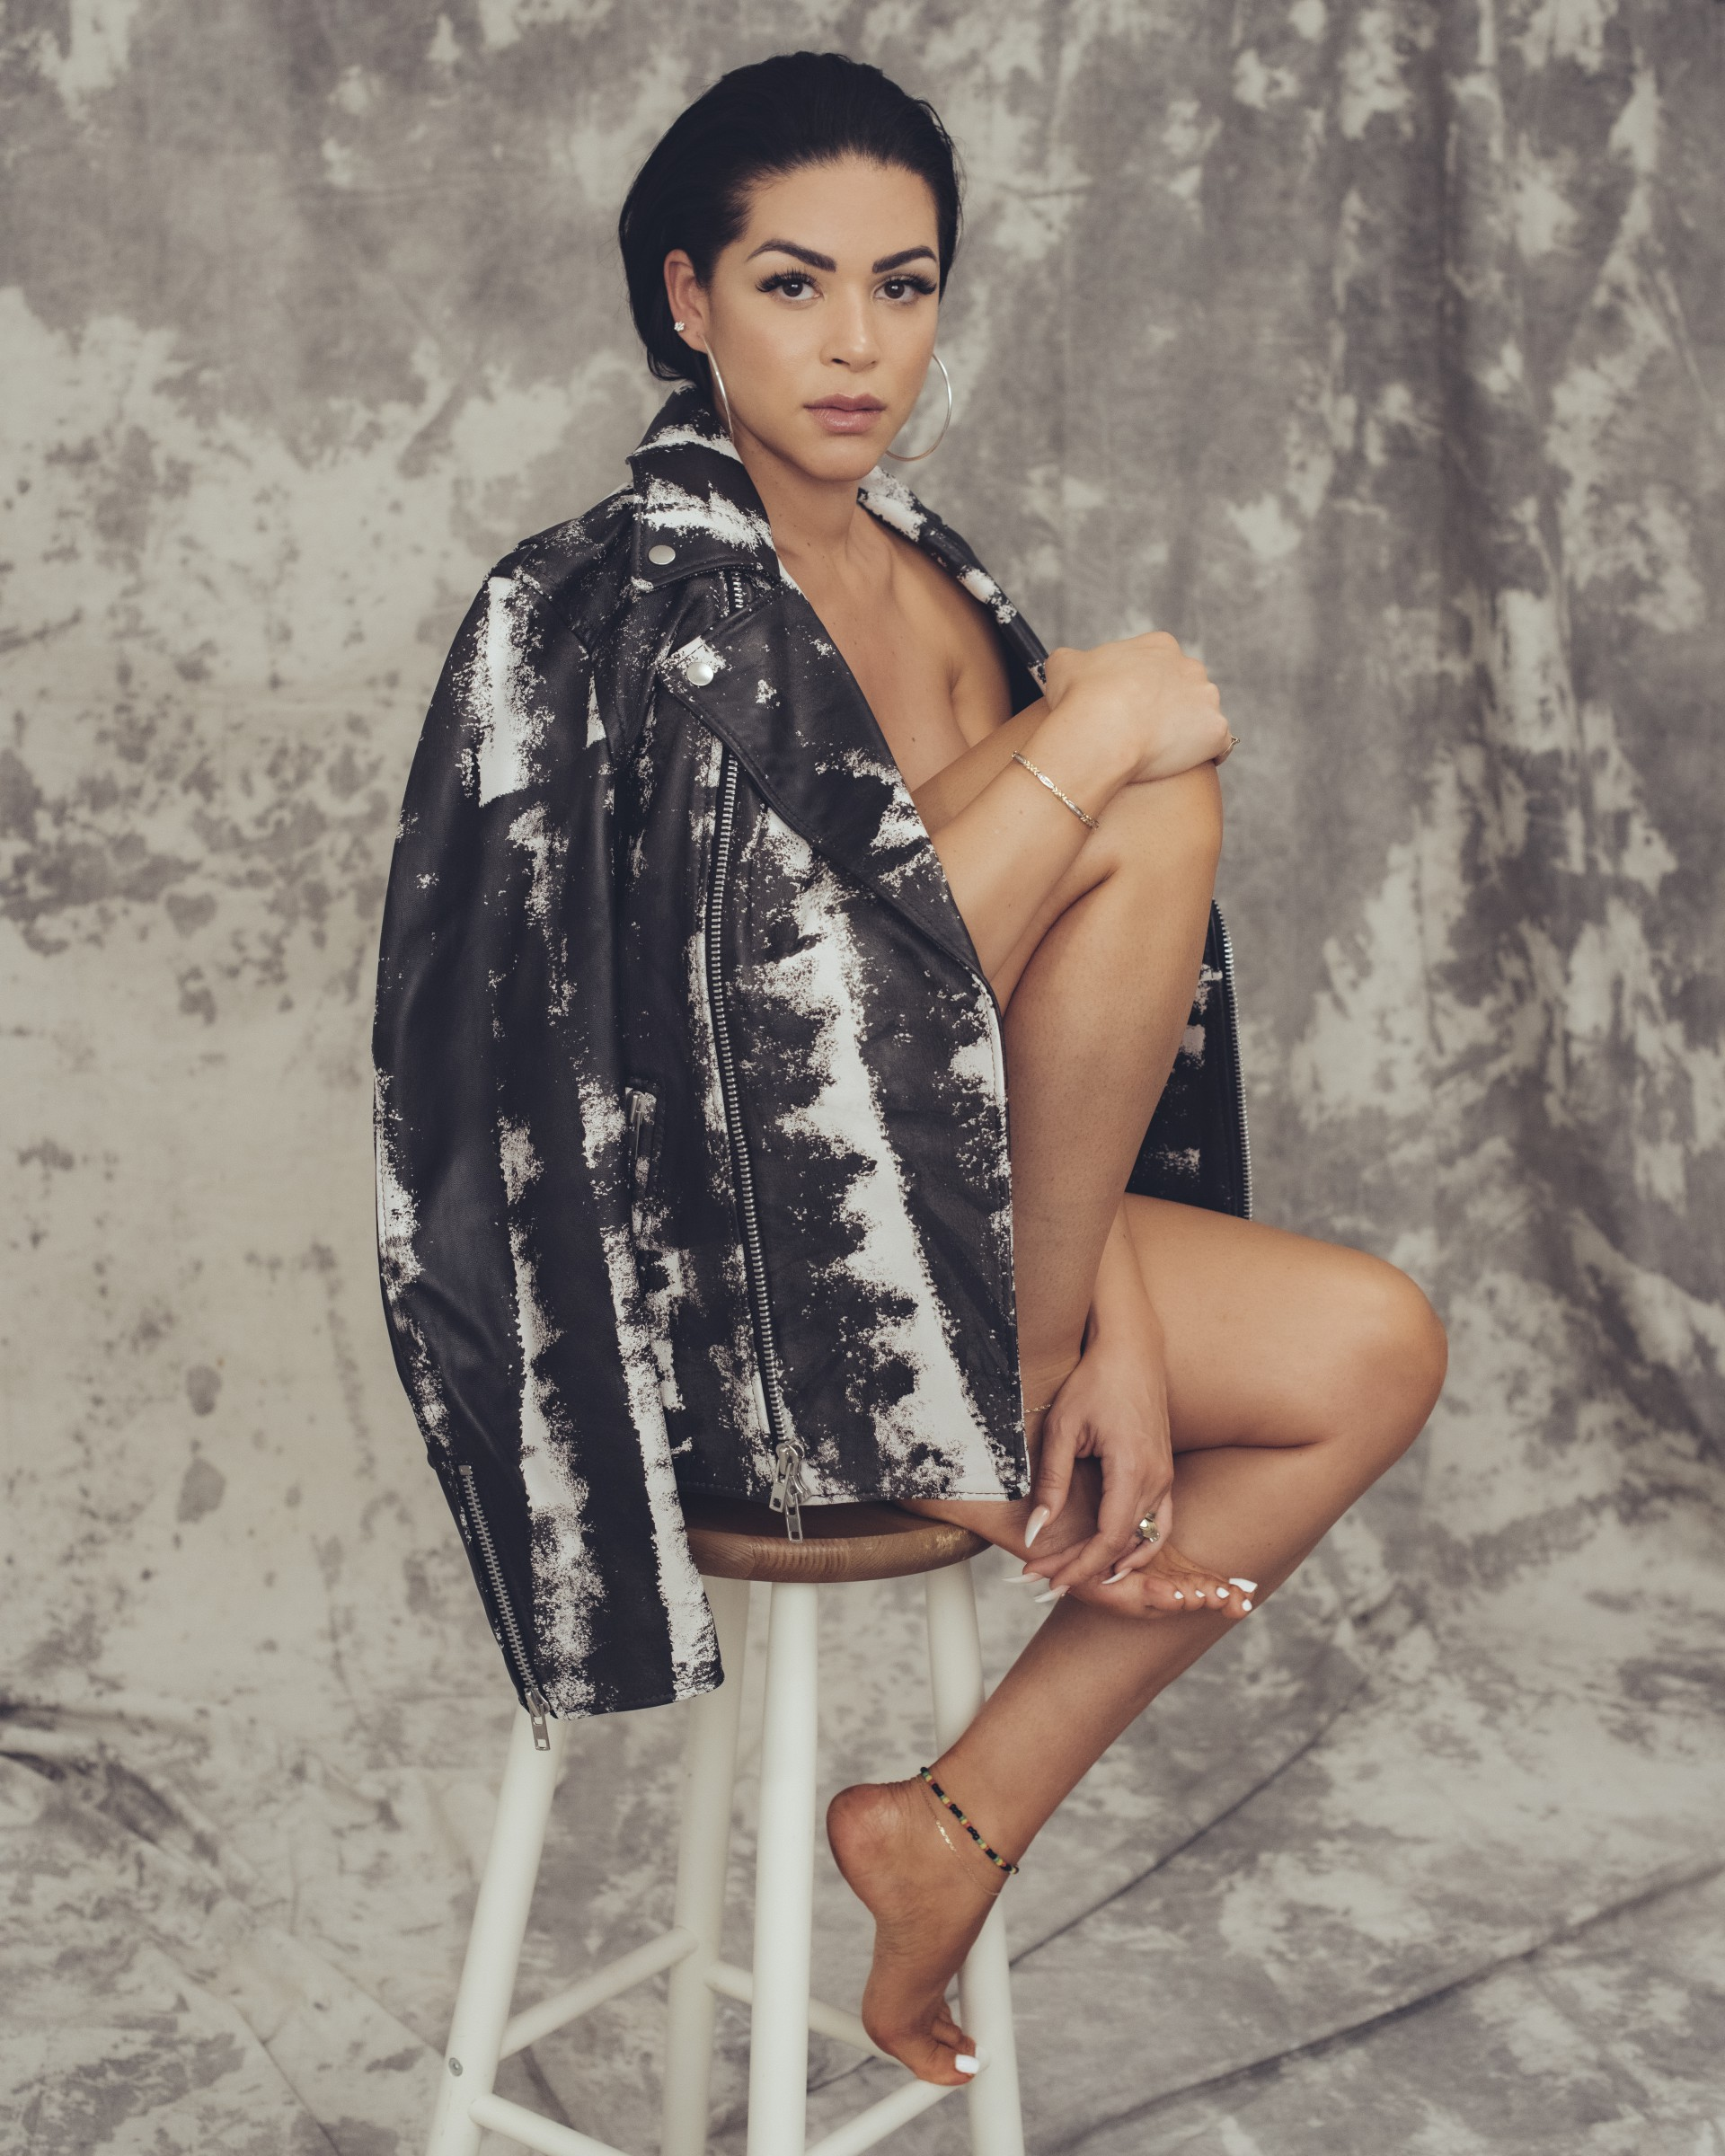 ANDREA TZELEPIDES Rebecca Silvera, Personal Styling